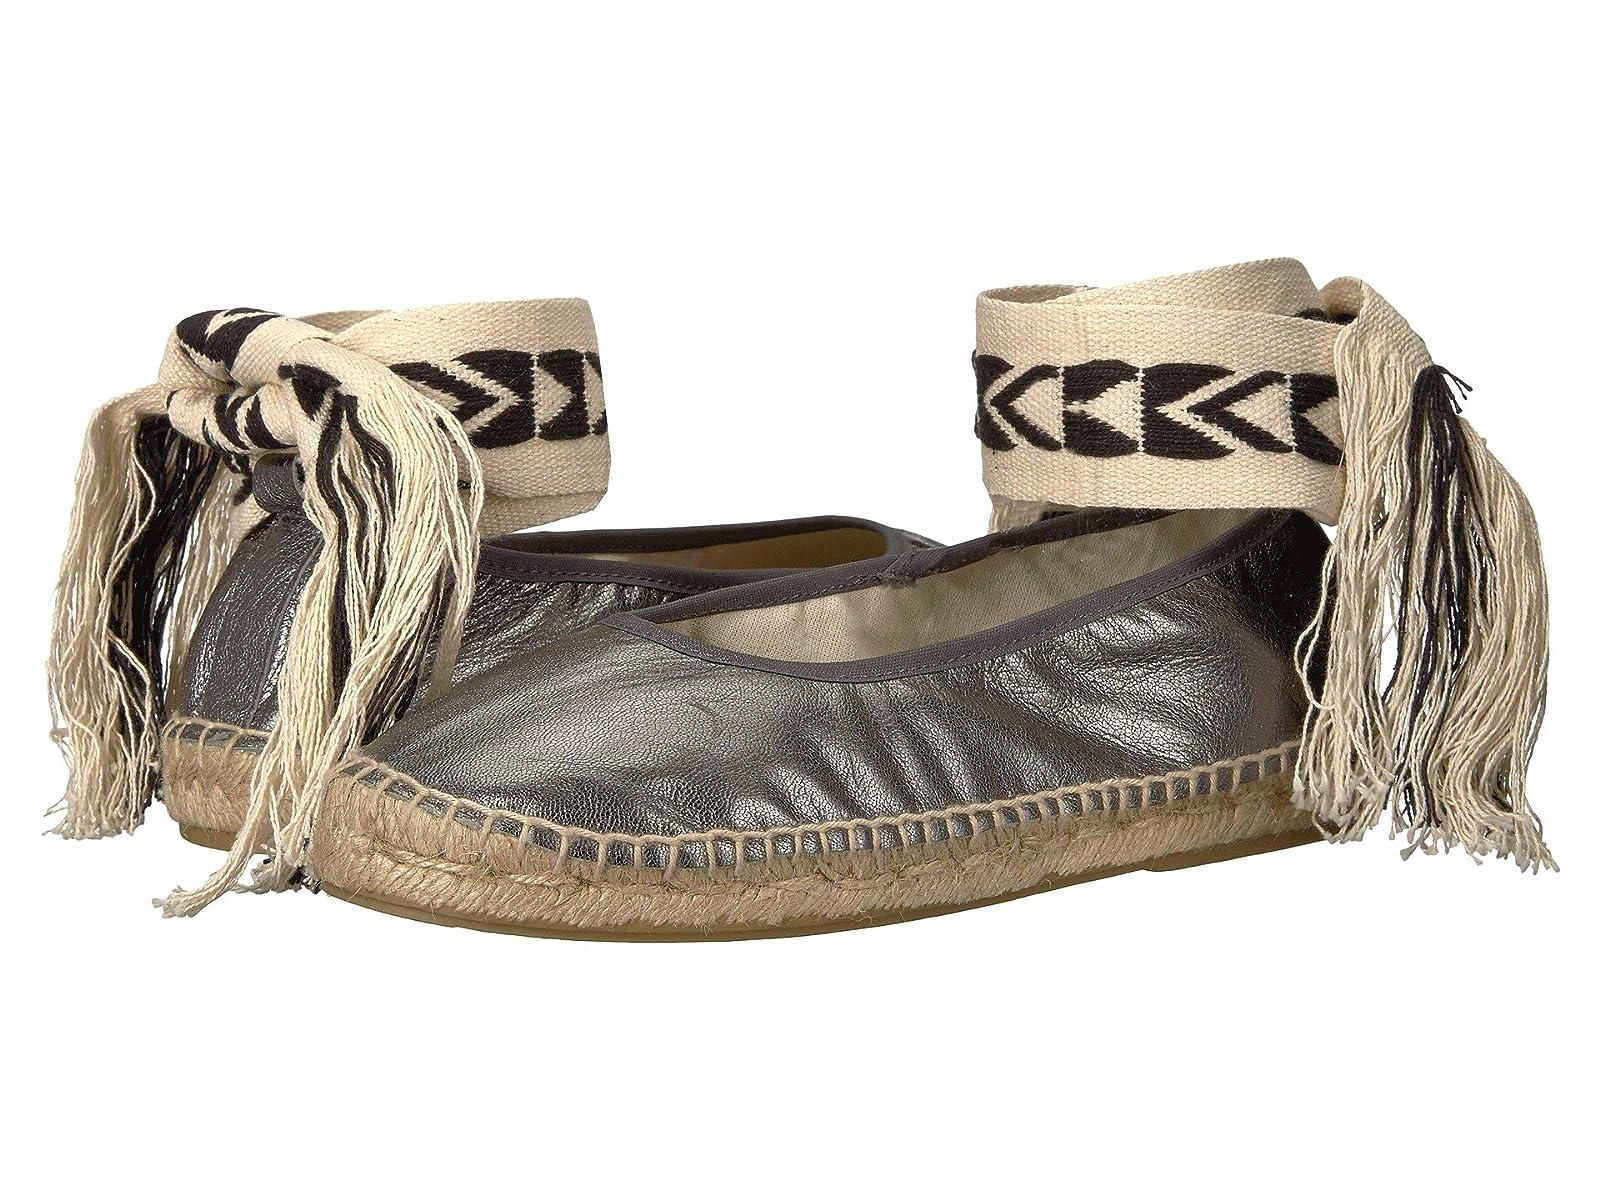 Free People Maya Wrap EspadrilleCheap and distinctive eye-catching shoes